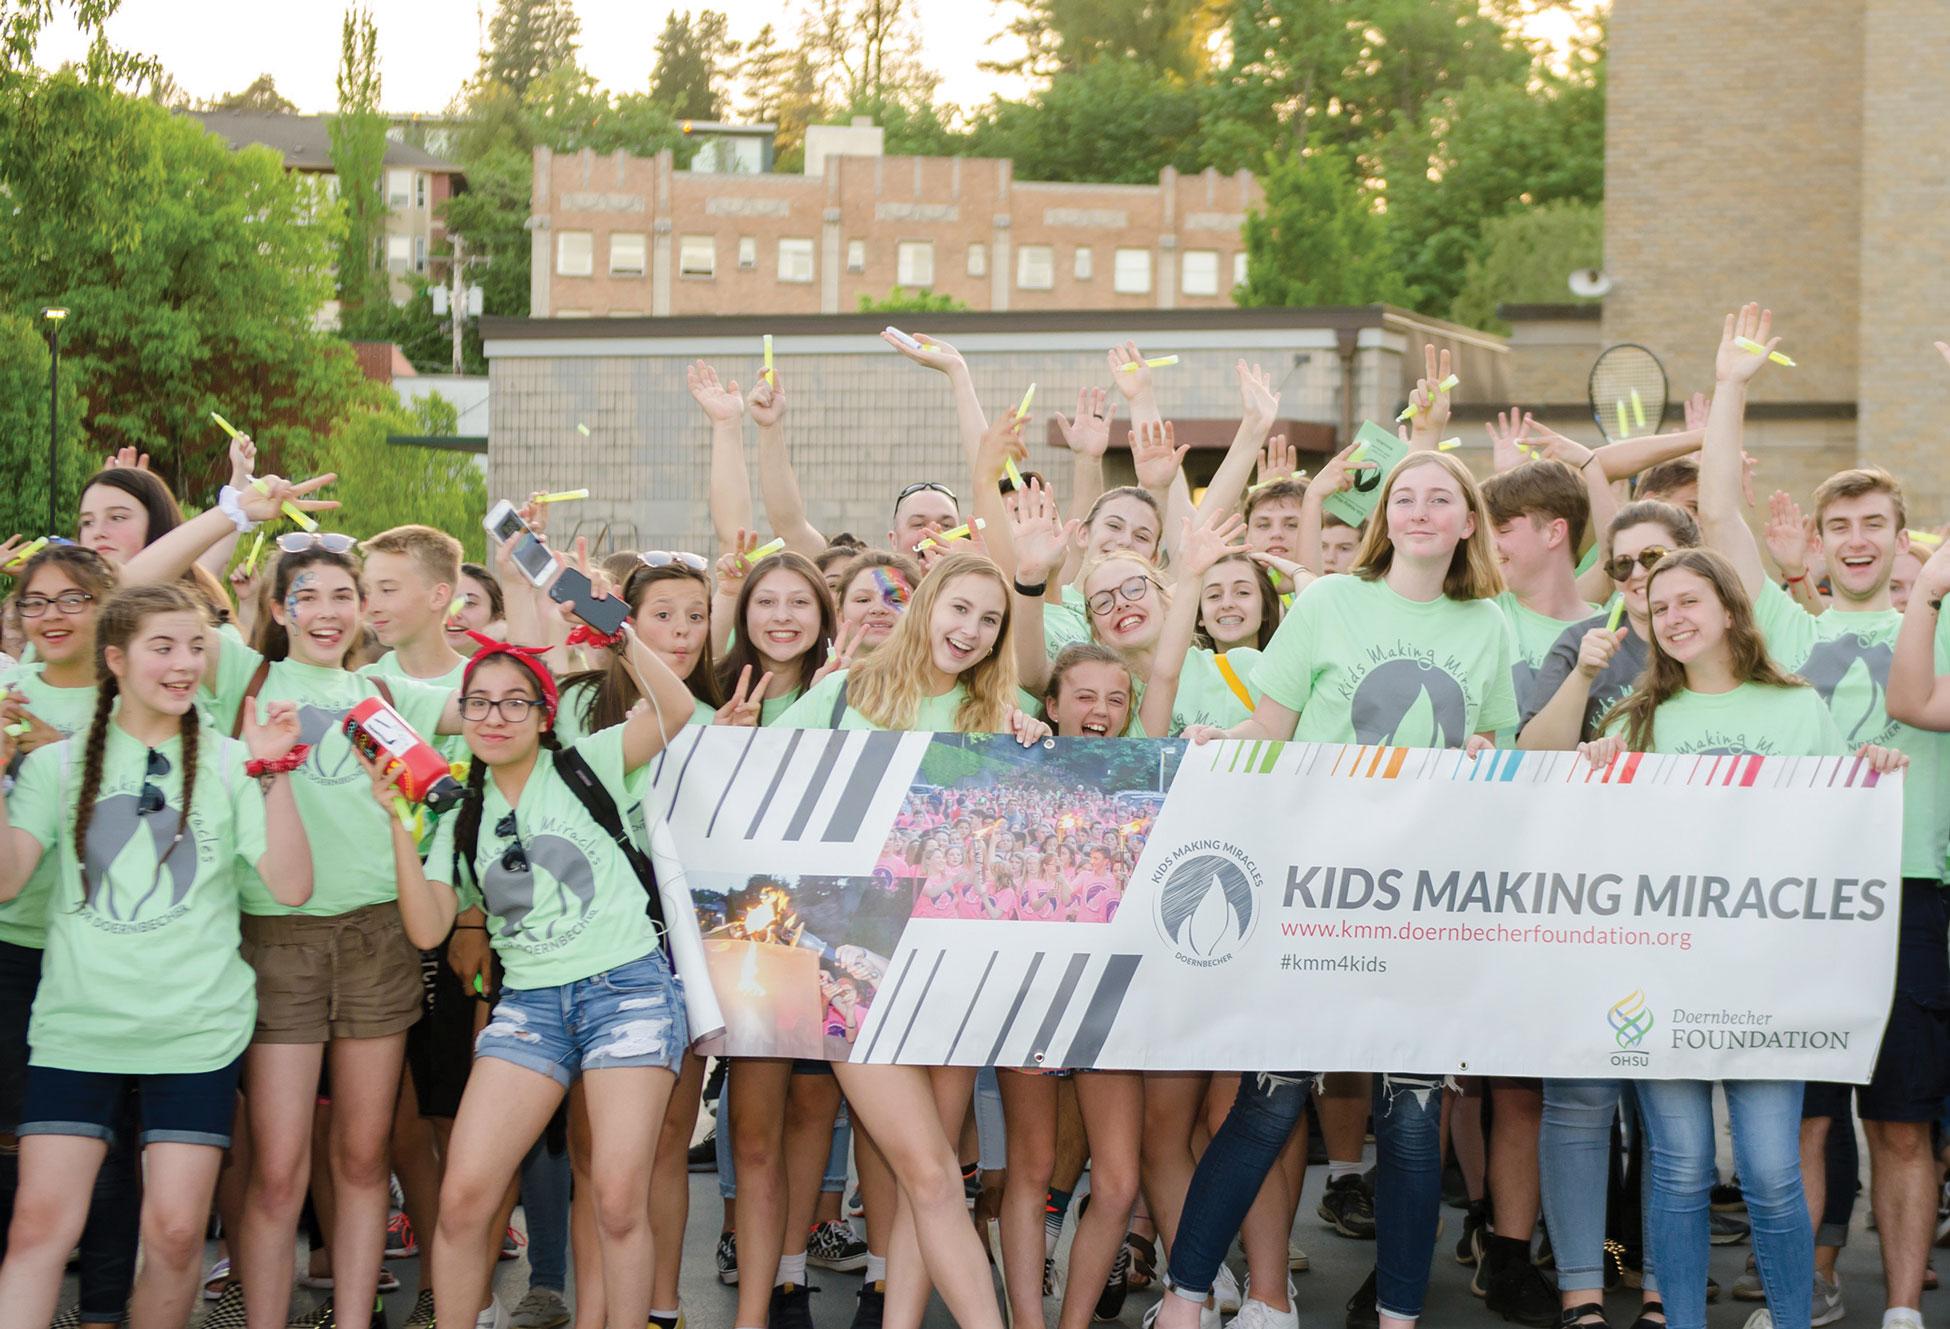 Students celebrate at Kids Making Miracles candlelight vigil